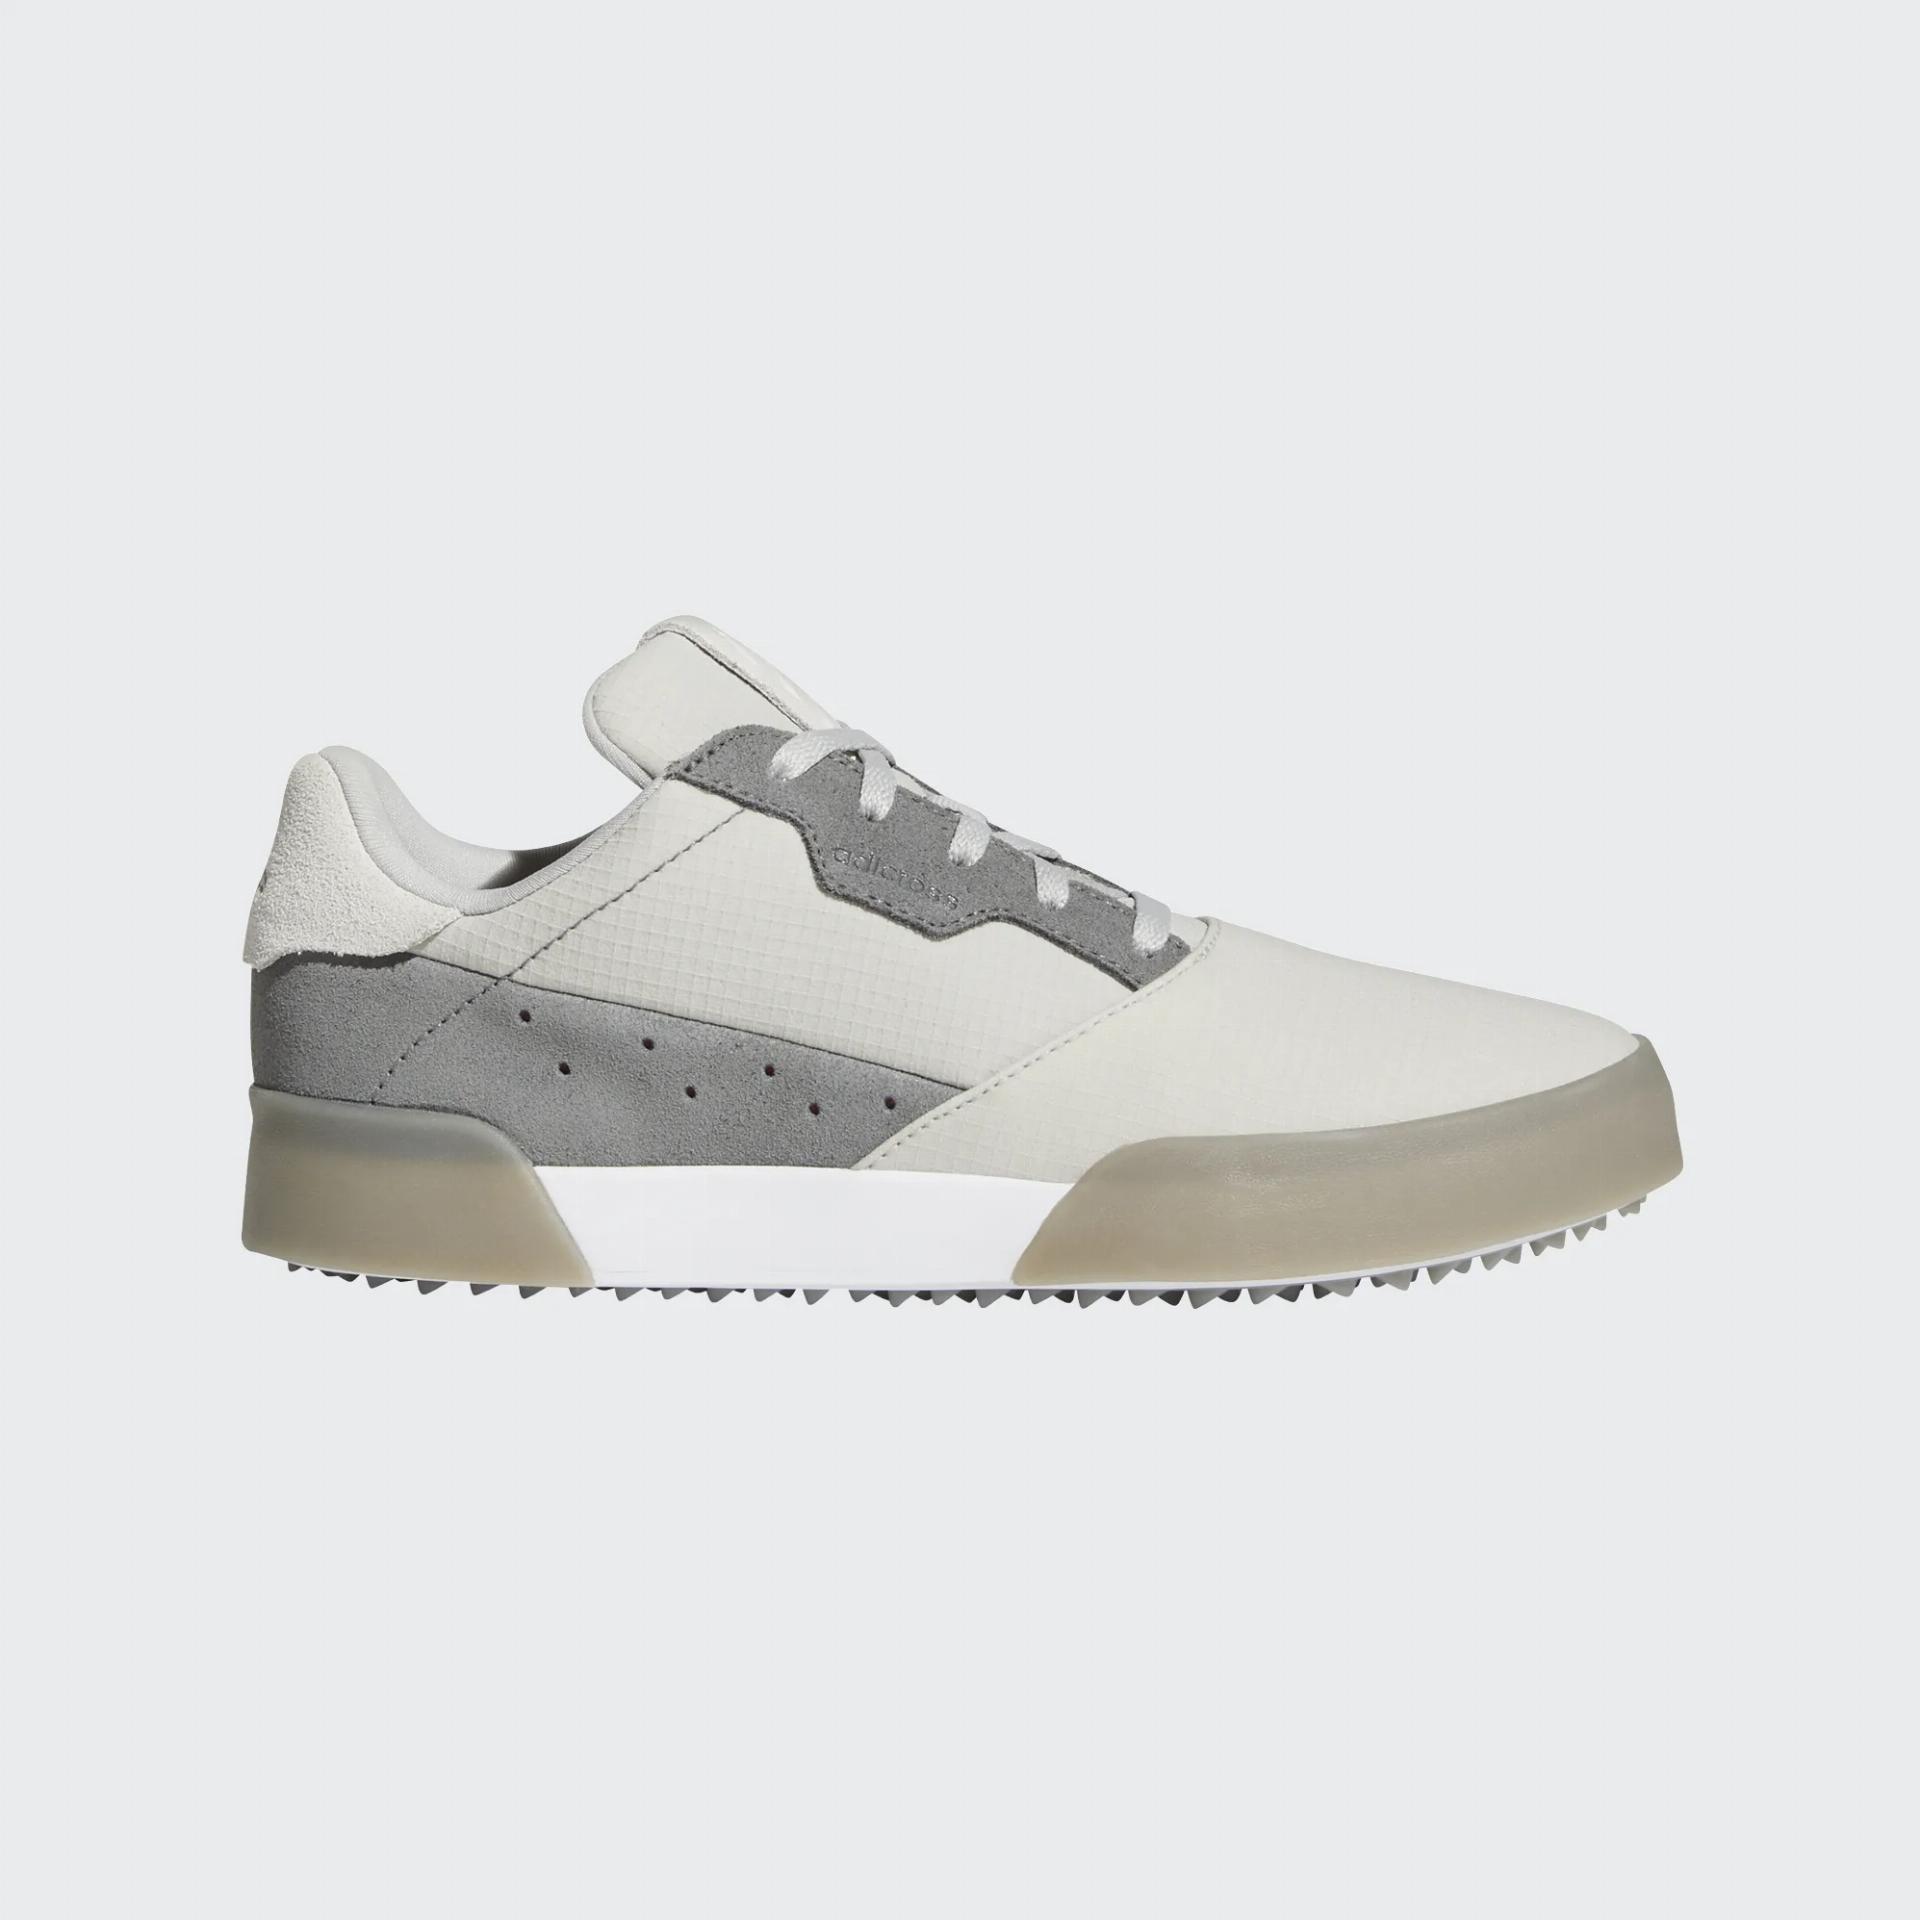 Adidas Junior - ADICROSS RETRO - grey